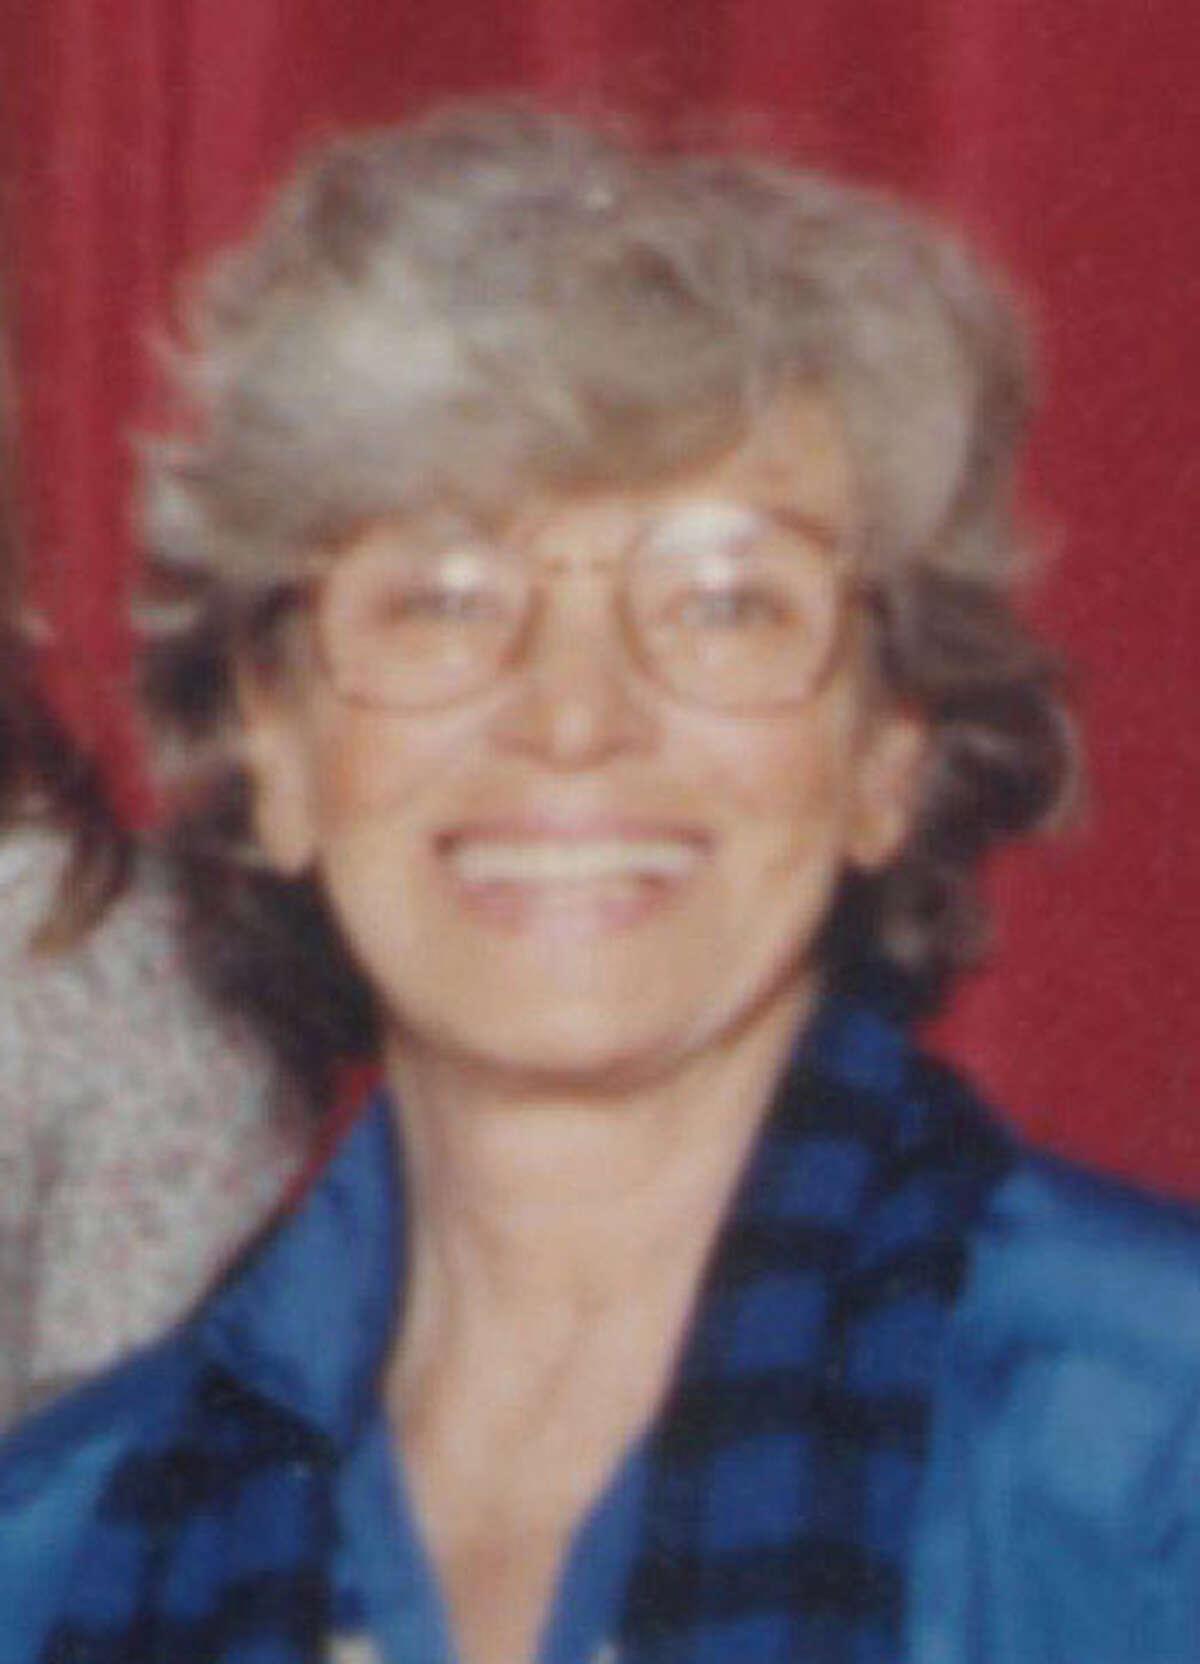 Joanne Trautwein in a 1994 school photo.